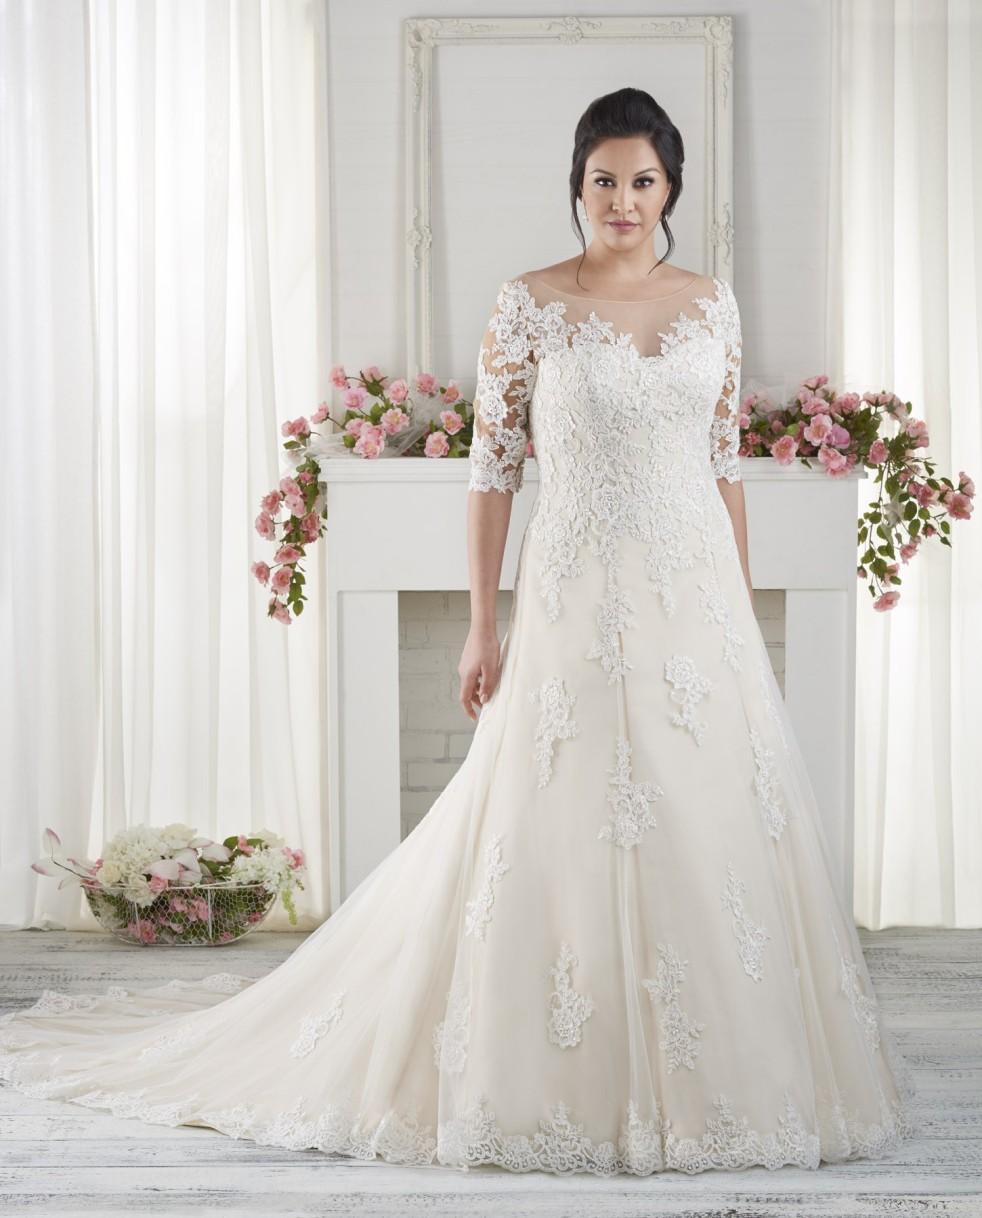 Full figured bridal gowns kathryn 39 s bridal blog for Wedding dresses for fuller figures